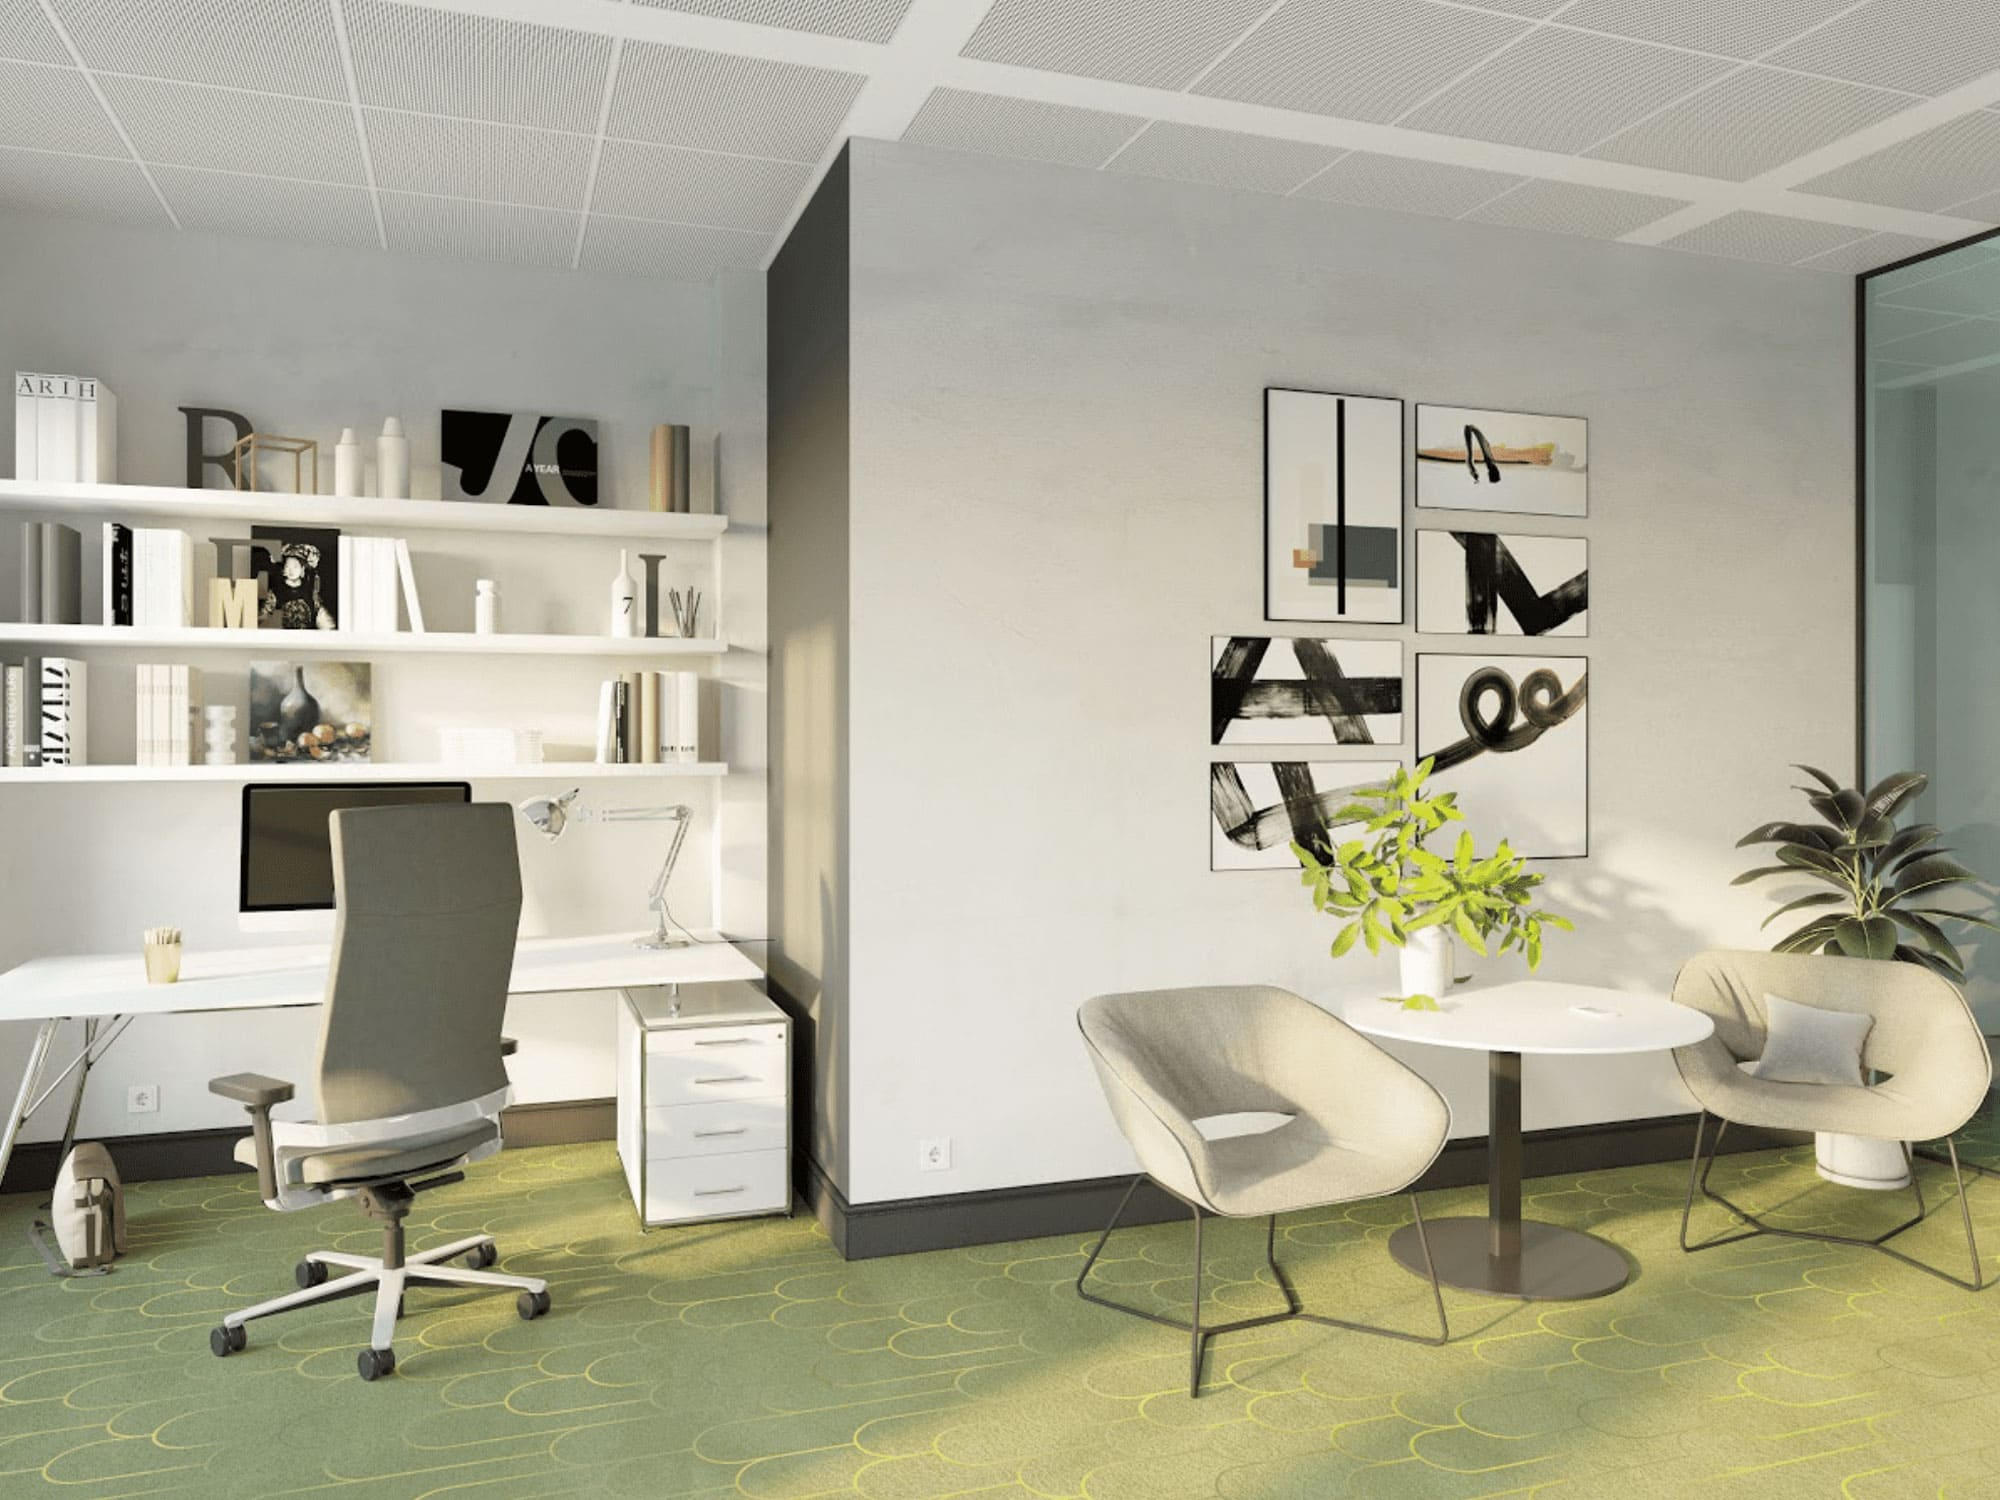 Grüner_Fußboden_im_Home-Office